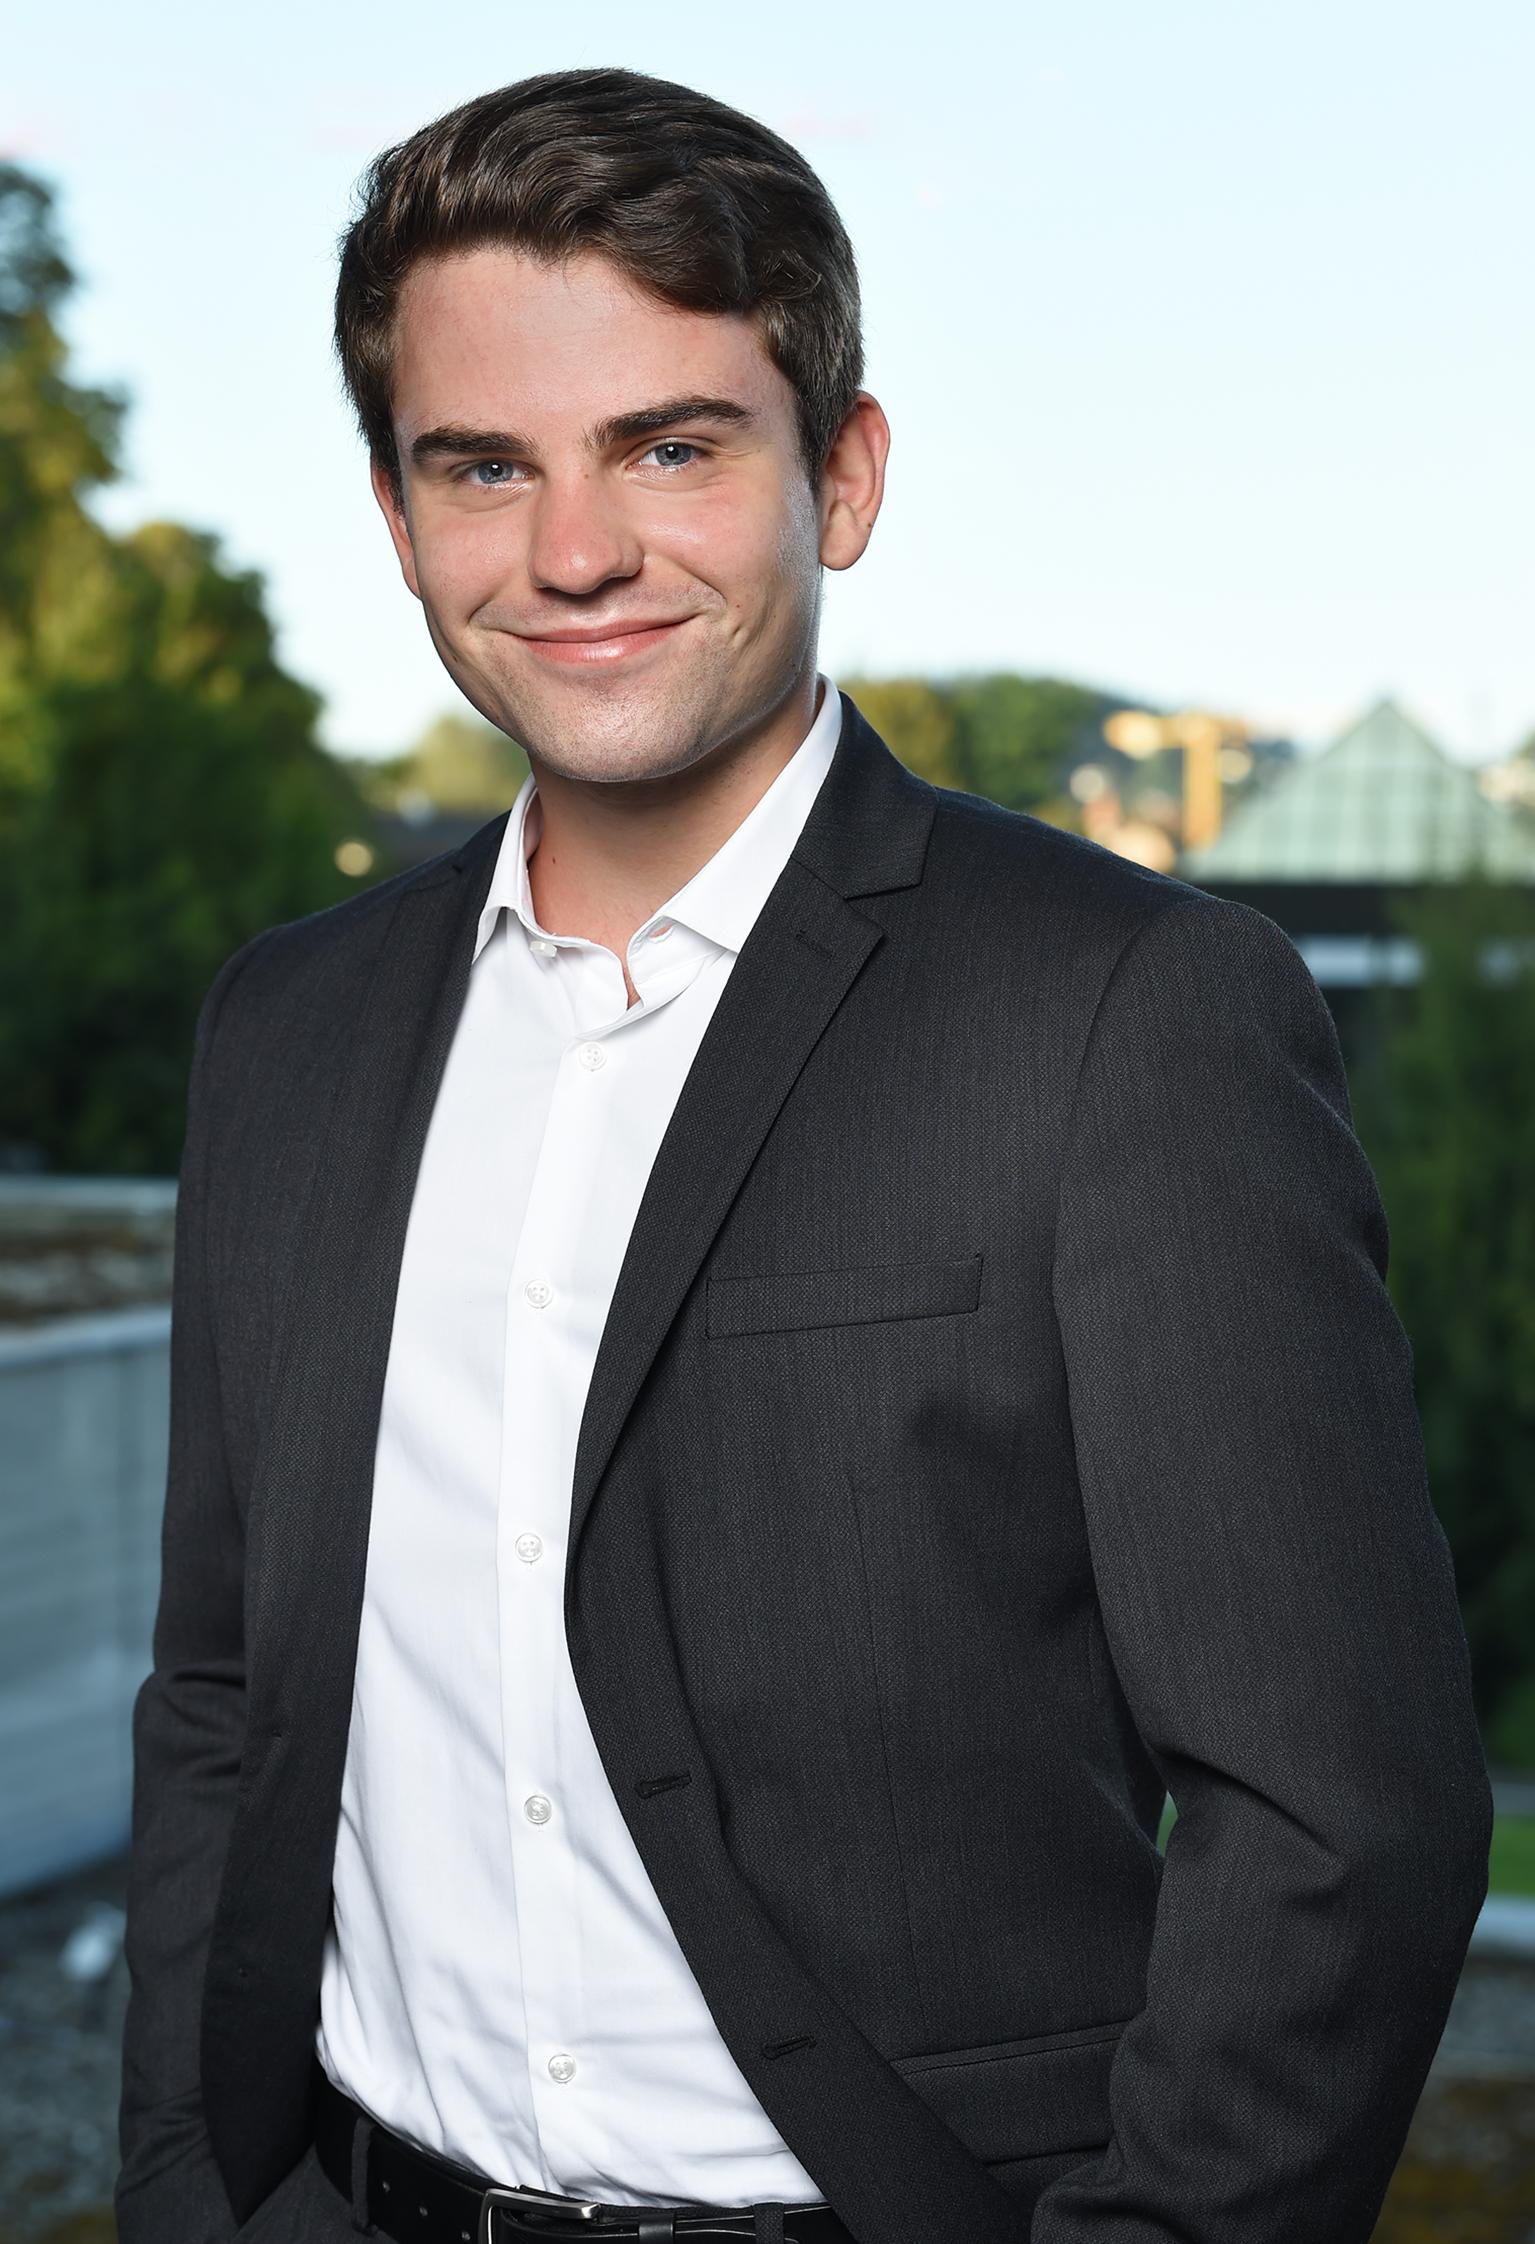 Julian Hufnagel